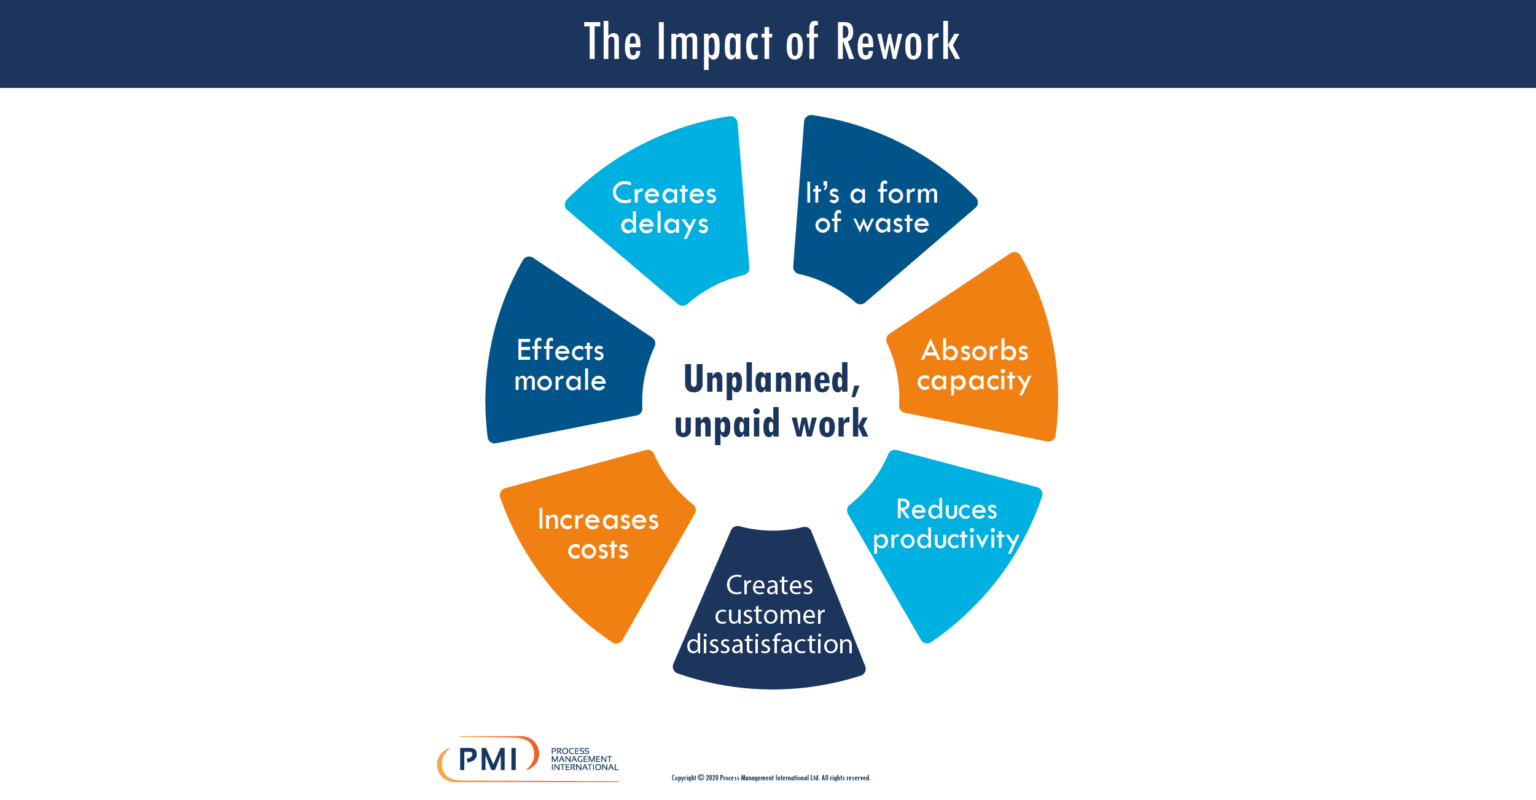 The Impact of Rework Infographic